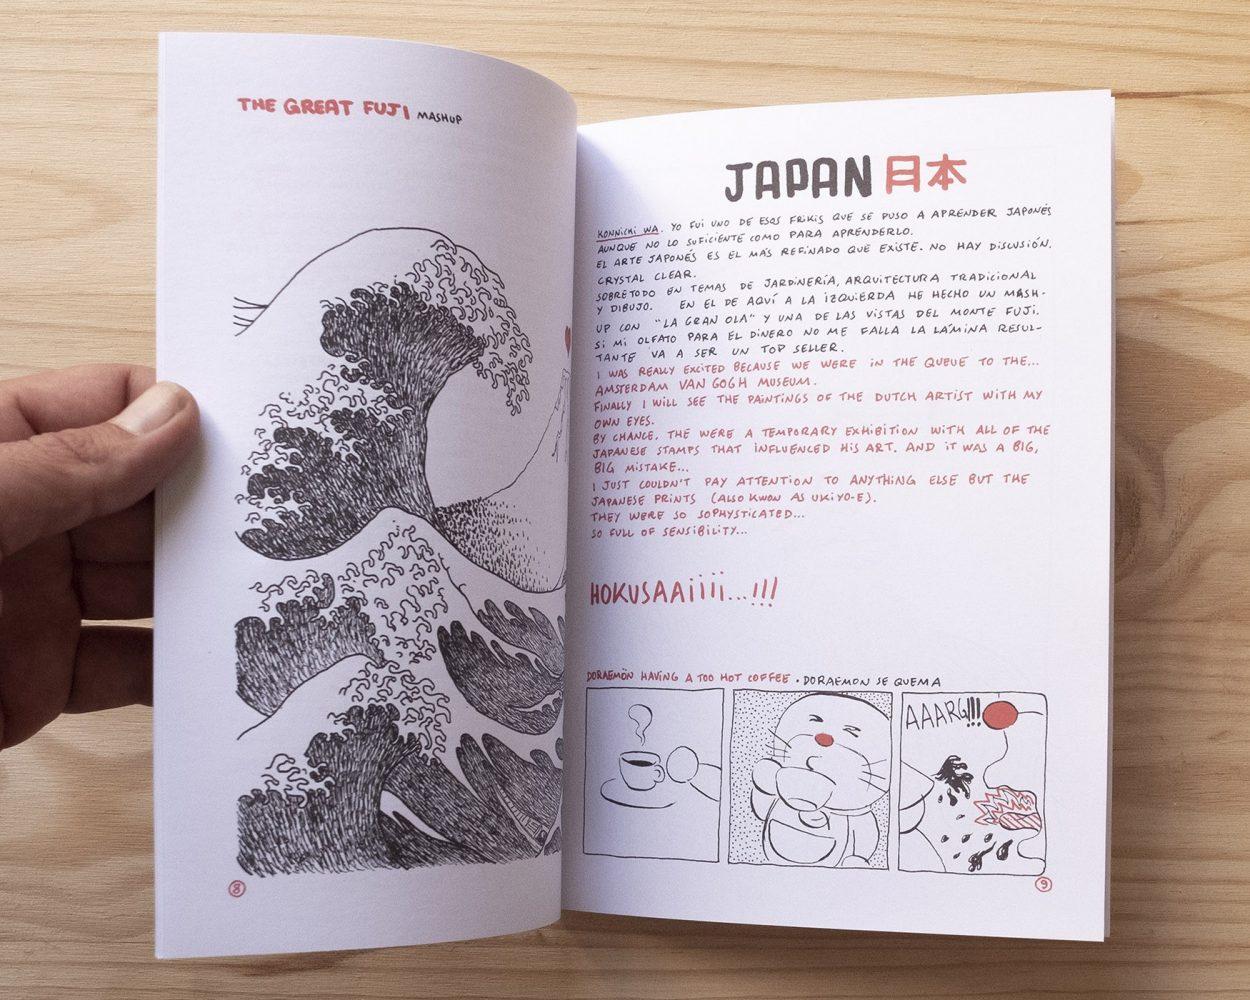 Comic experimental dibujo underground. La gran Ola